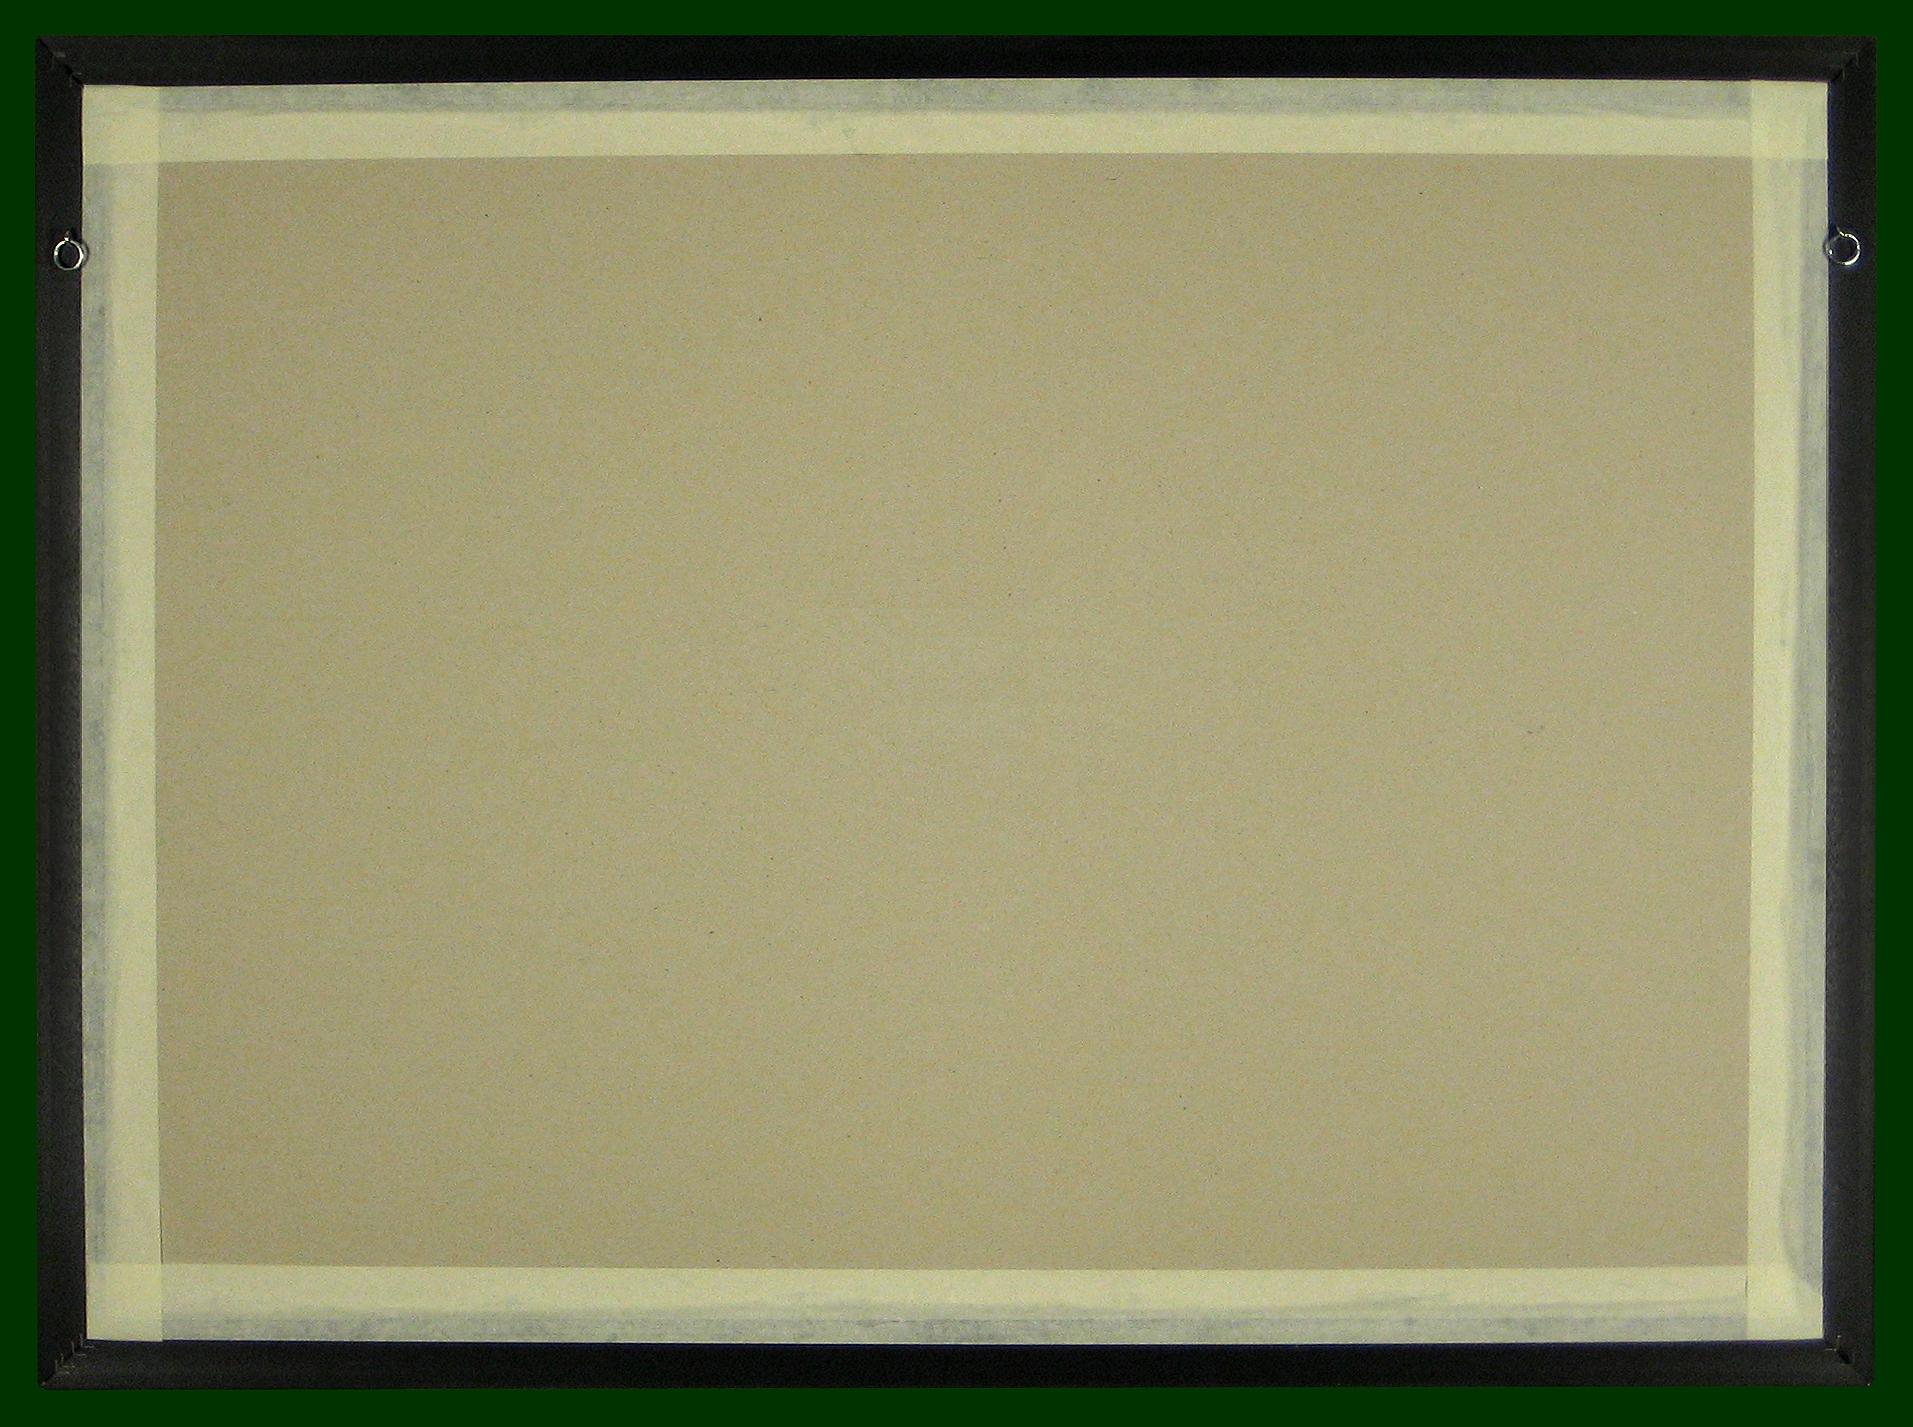 17-12h_t.jpg (1913×1427)